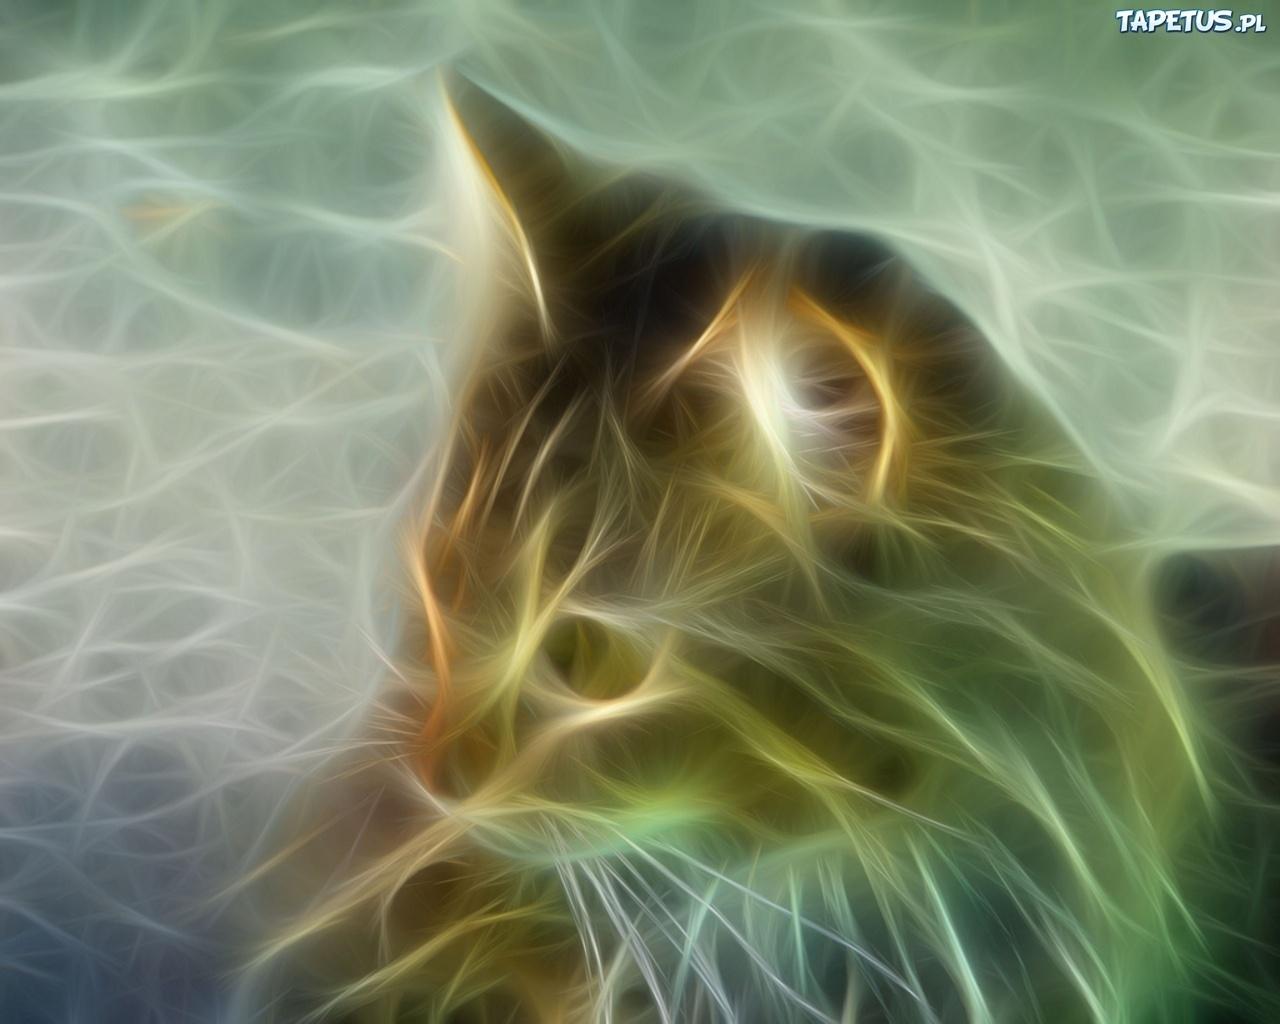 Kot Wąsy